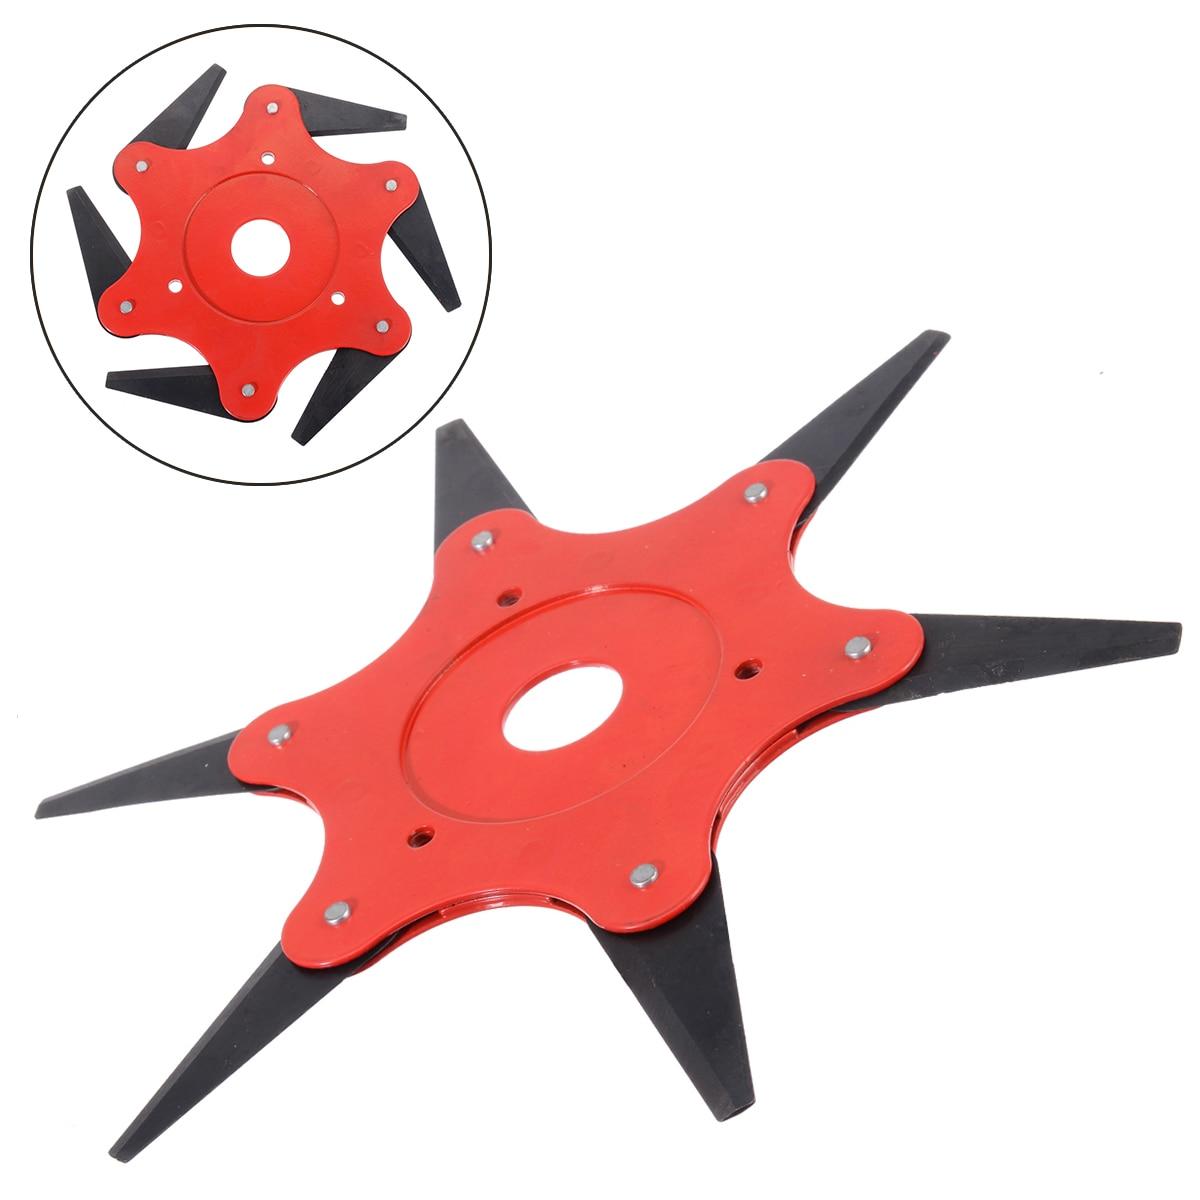 6 Blades Grass Trimmer Head 65Mn Brush Cutter Weed Brush Cutting Head Easy Cutting Garden Power Tool Accessories